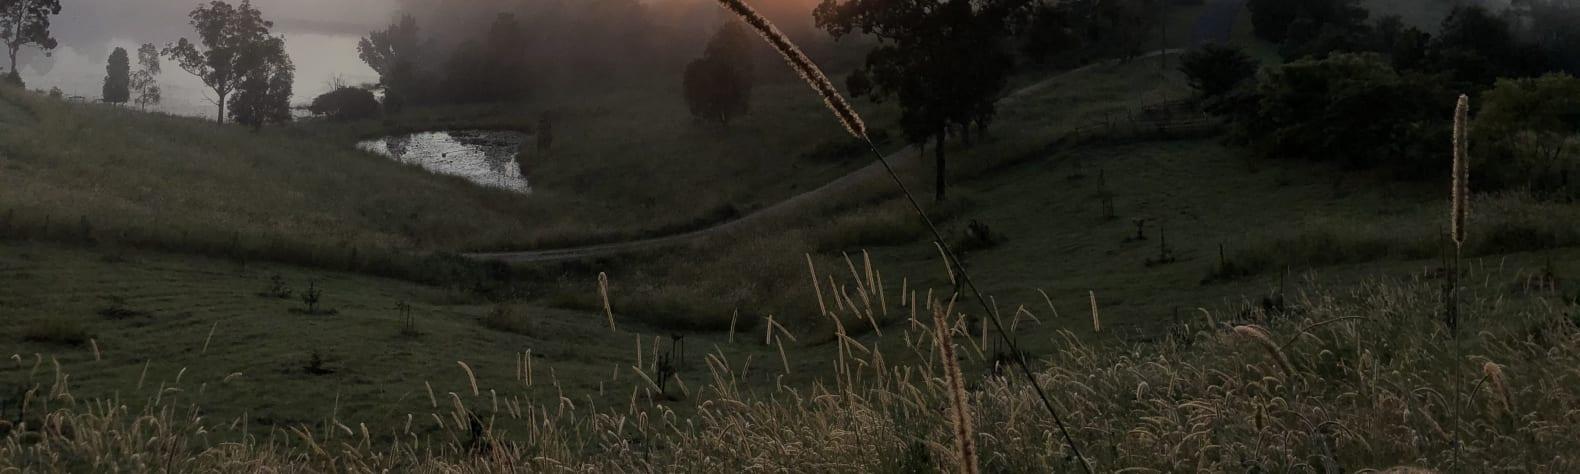 Sacred Earth Farm